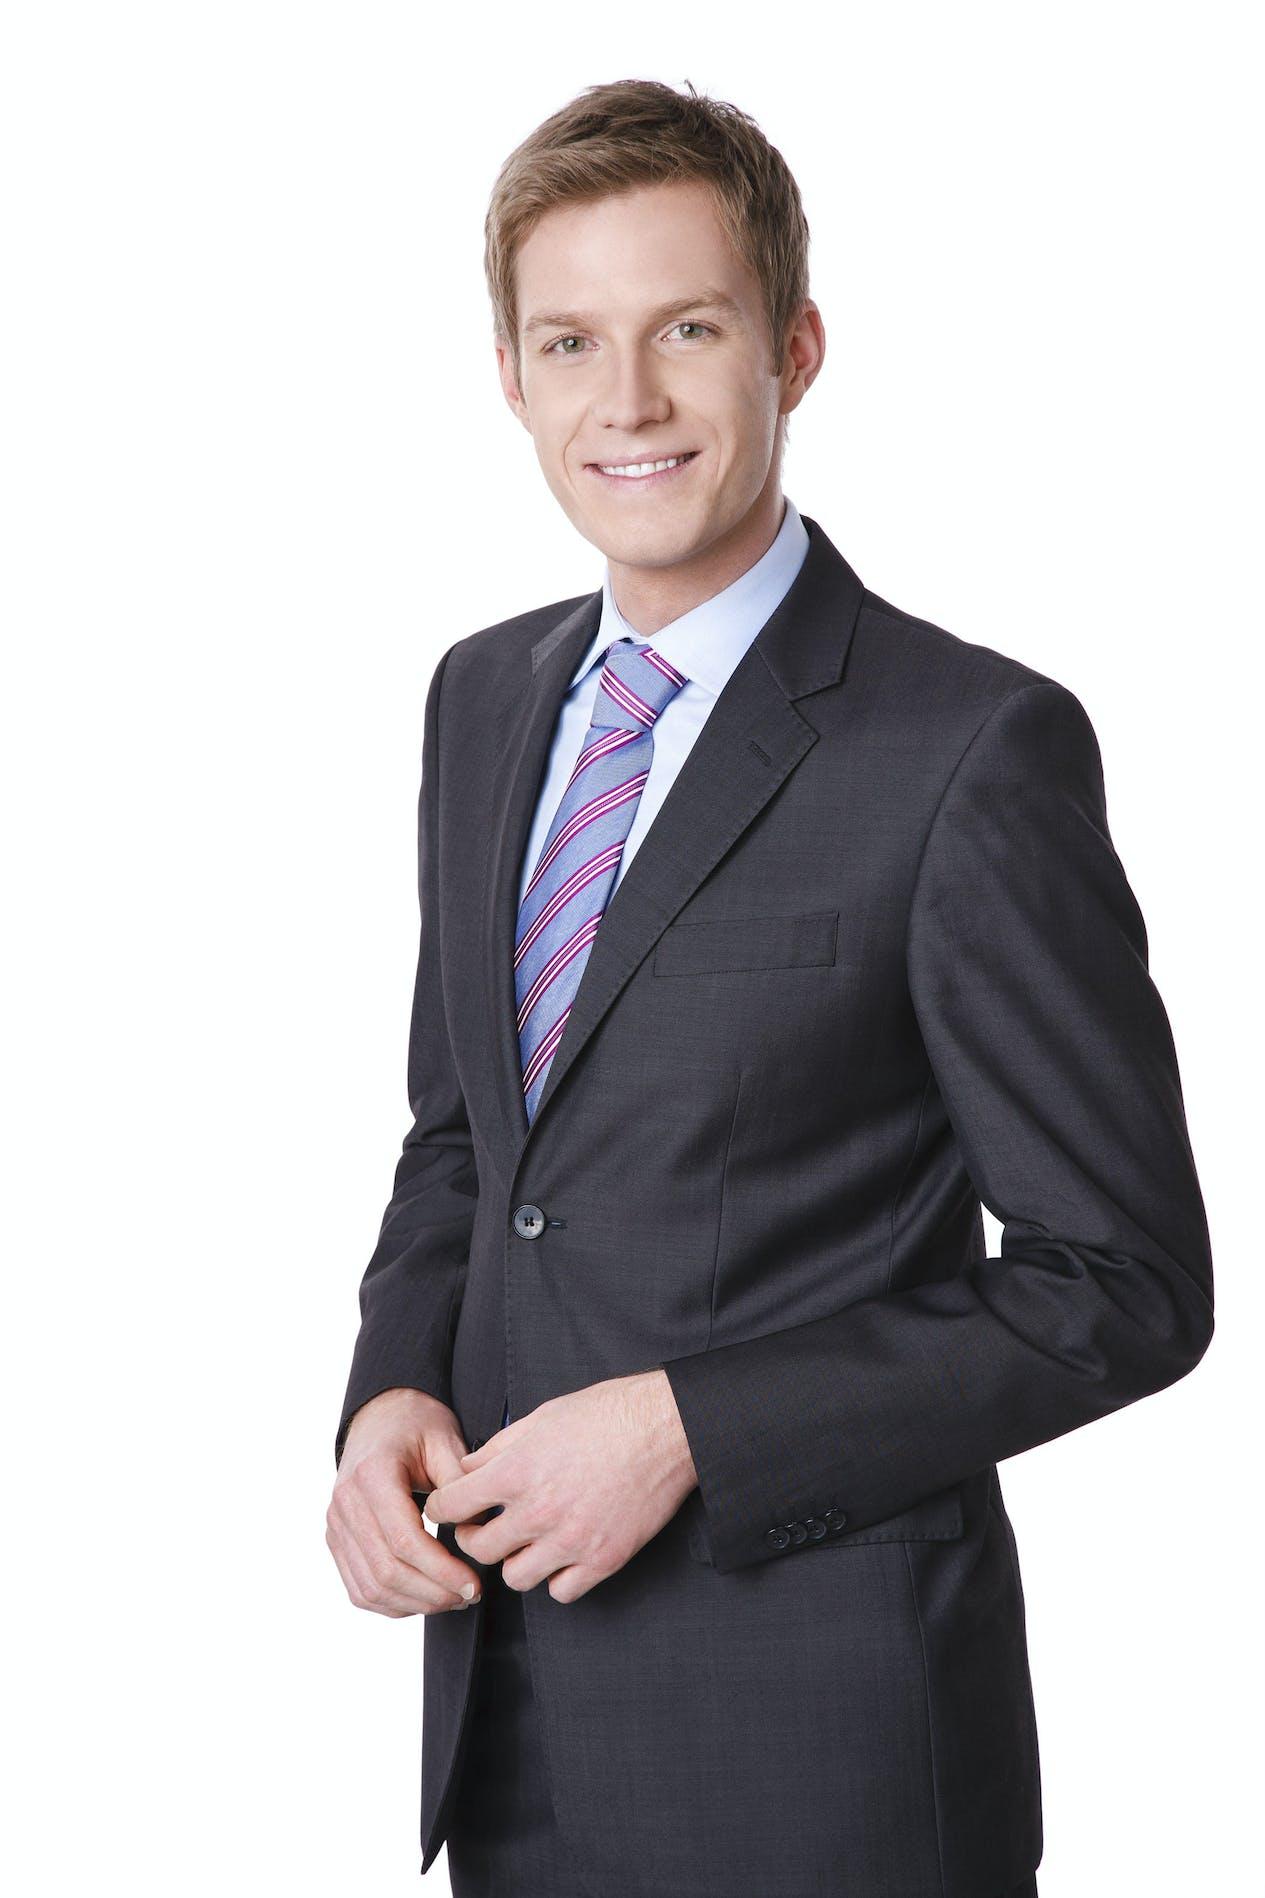 (c) PULS 4 - Jürgen Hammerschmid